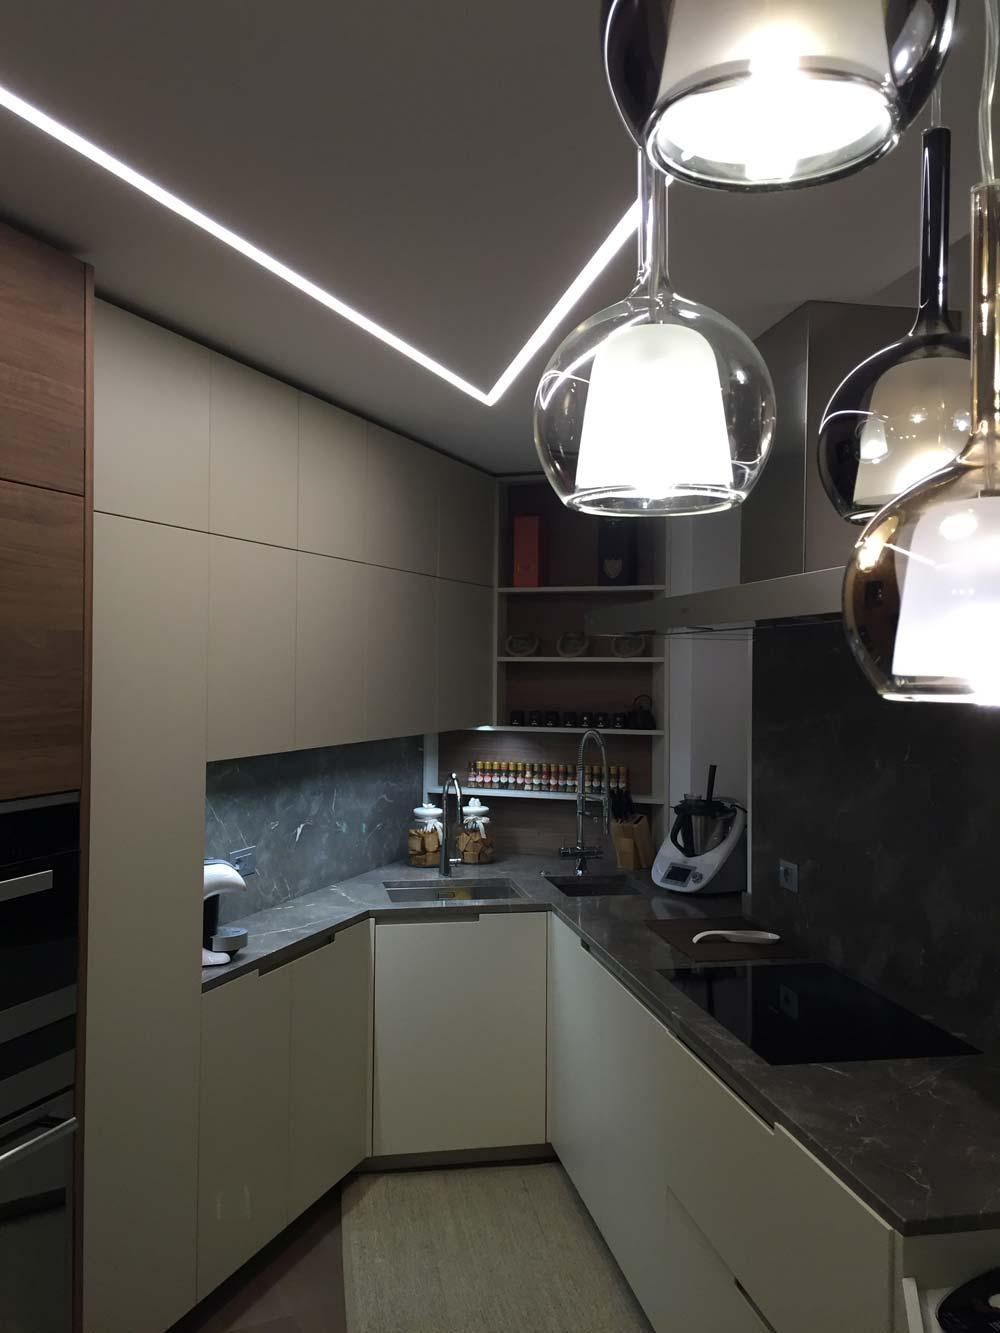 Studio design cucina monza32 cardin design for Design cucina